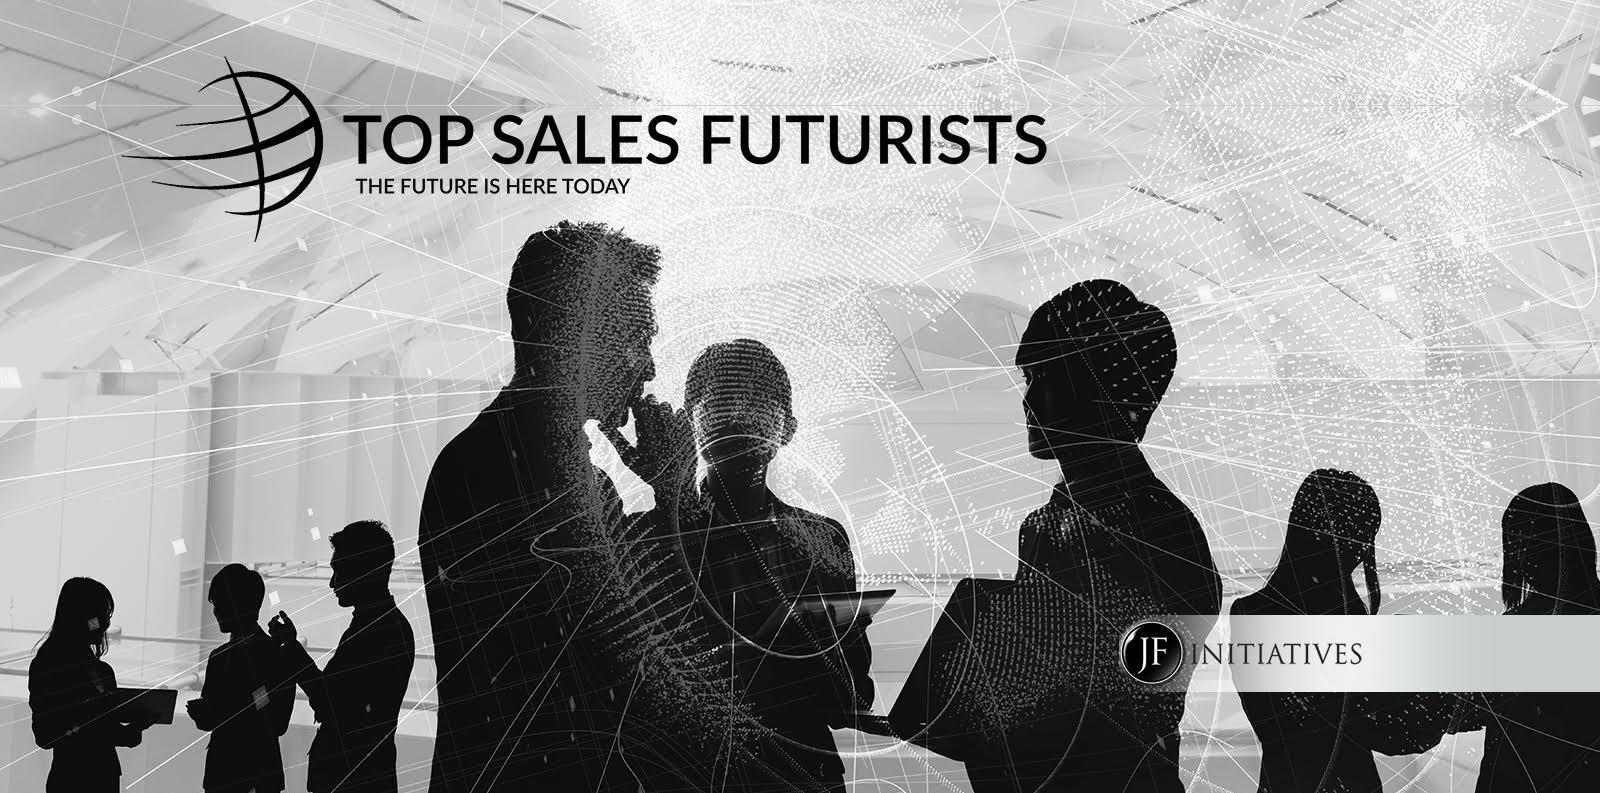 The Top Sales Futurists